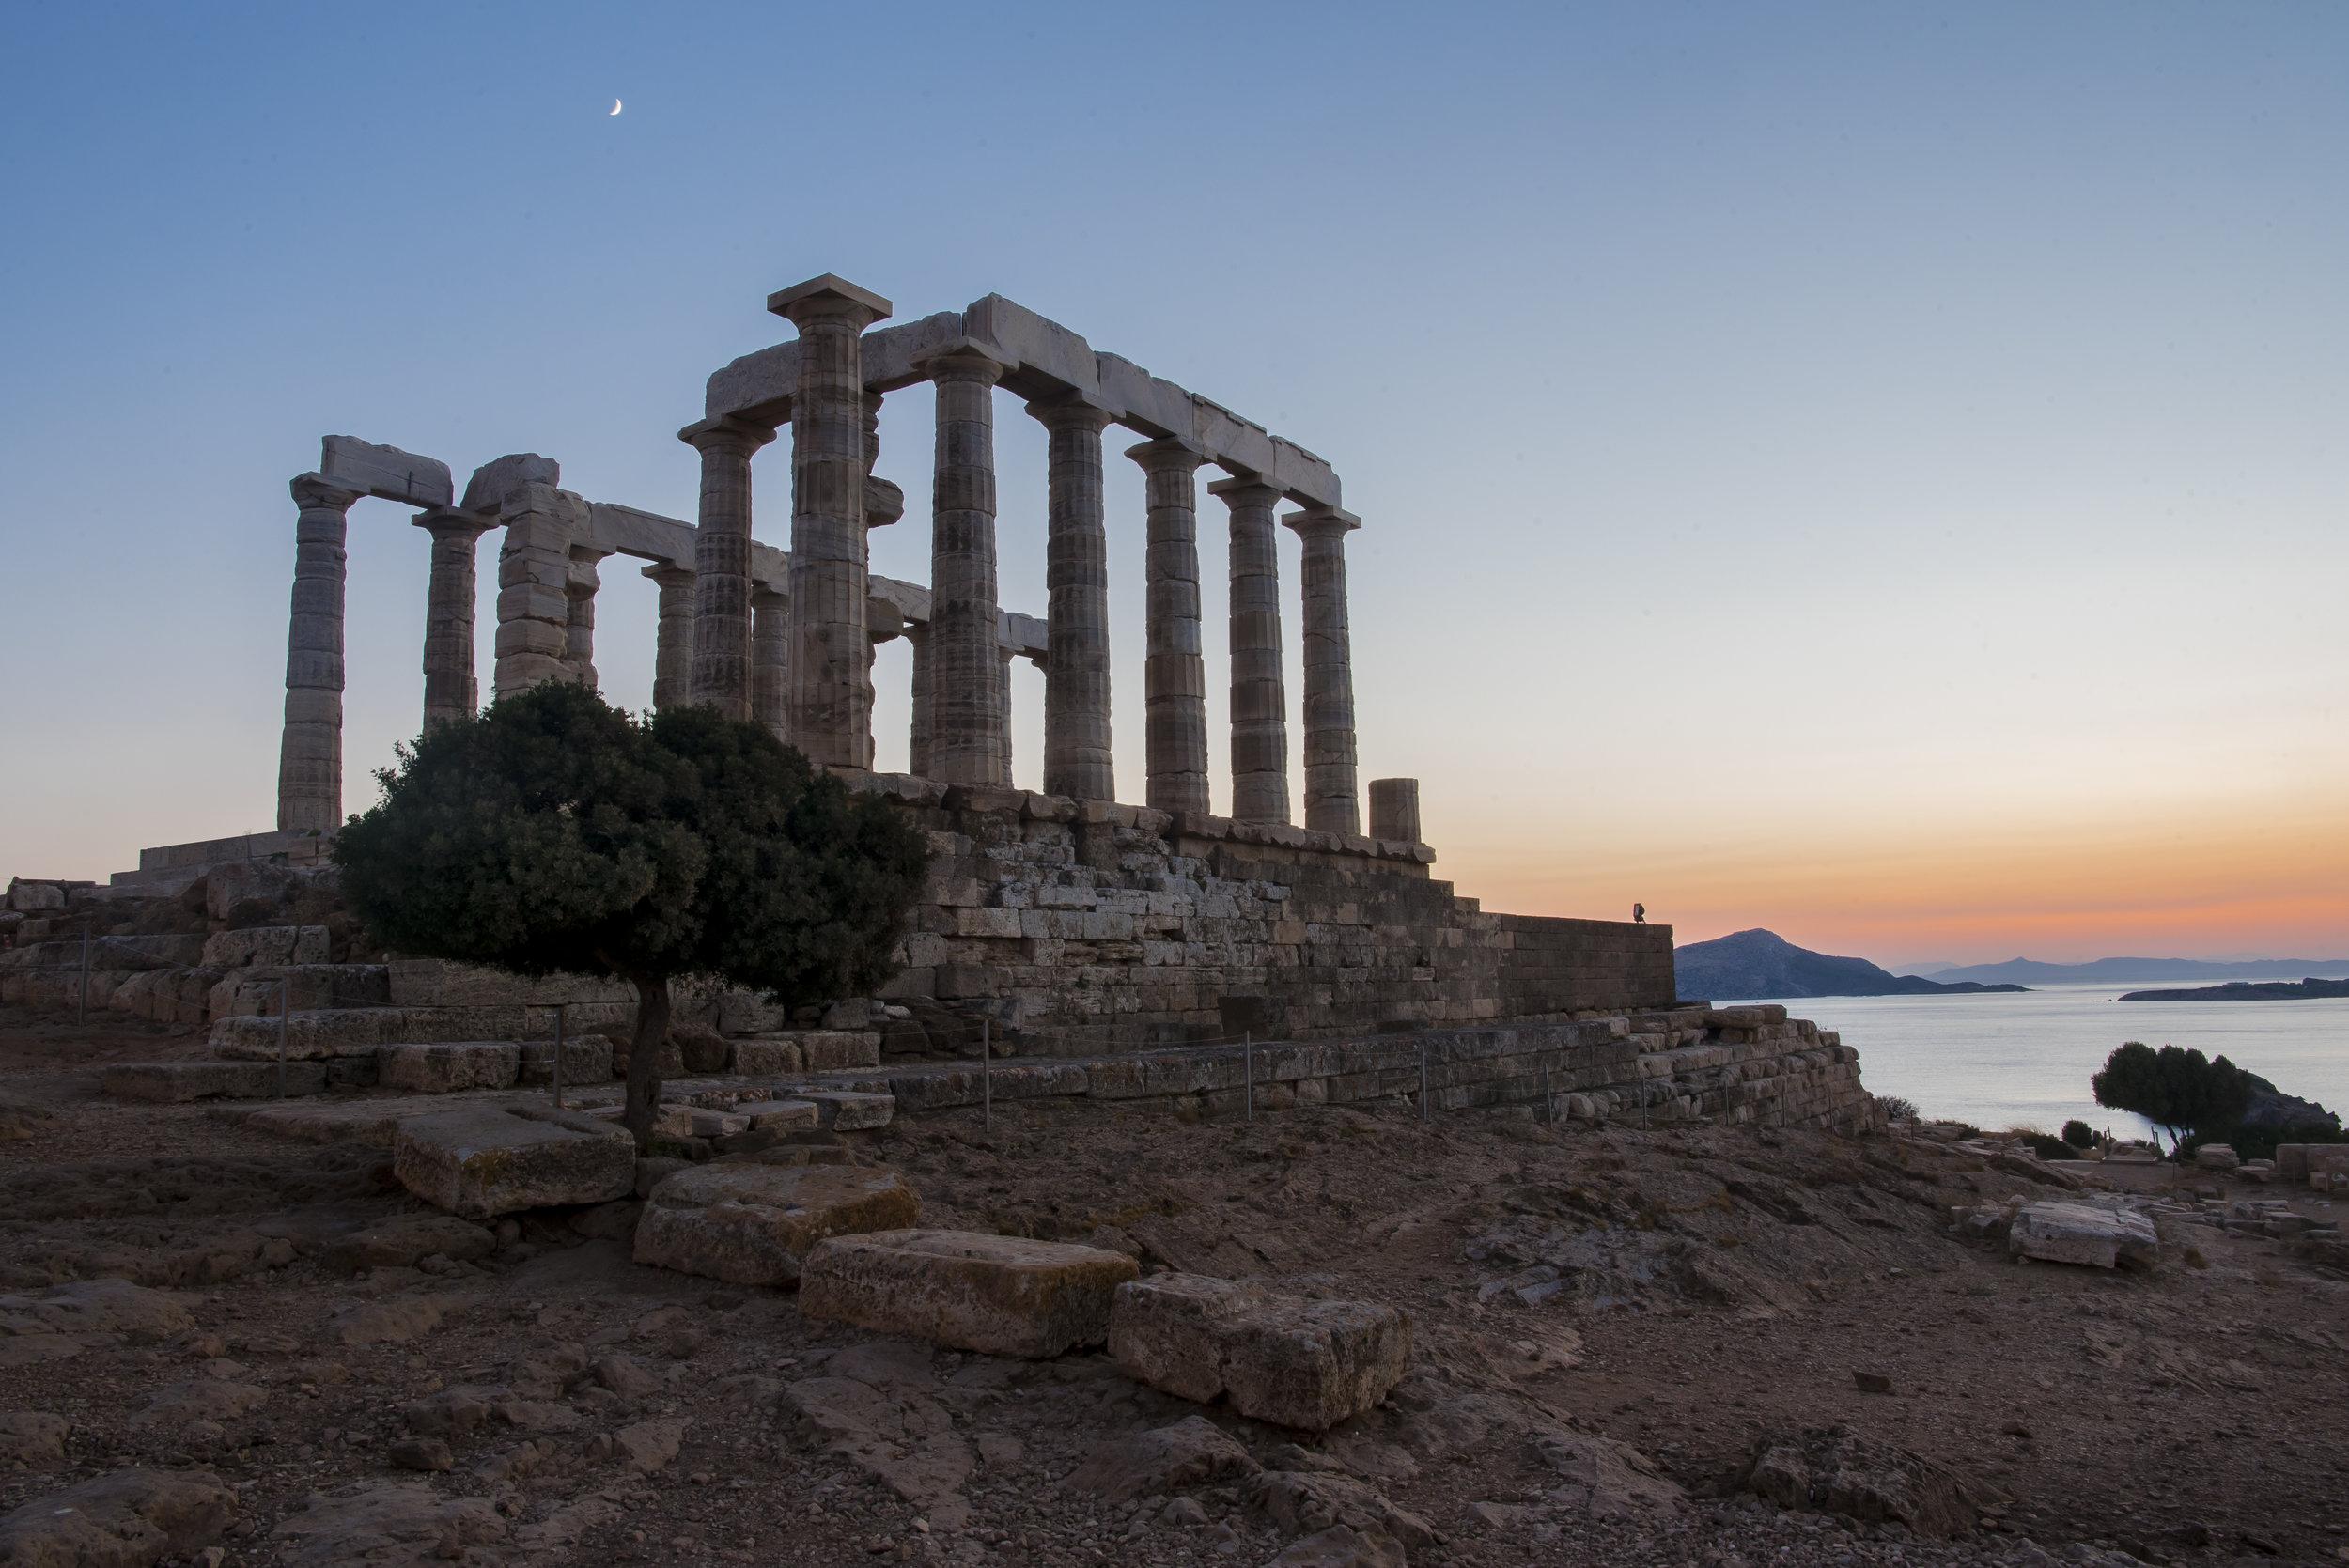 Greek Sunset - Temple of Poseidon (Sounio, Greece)